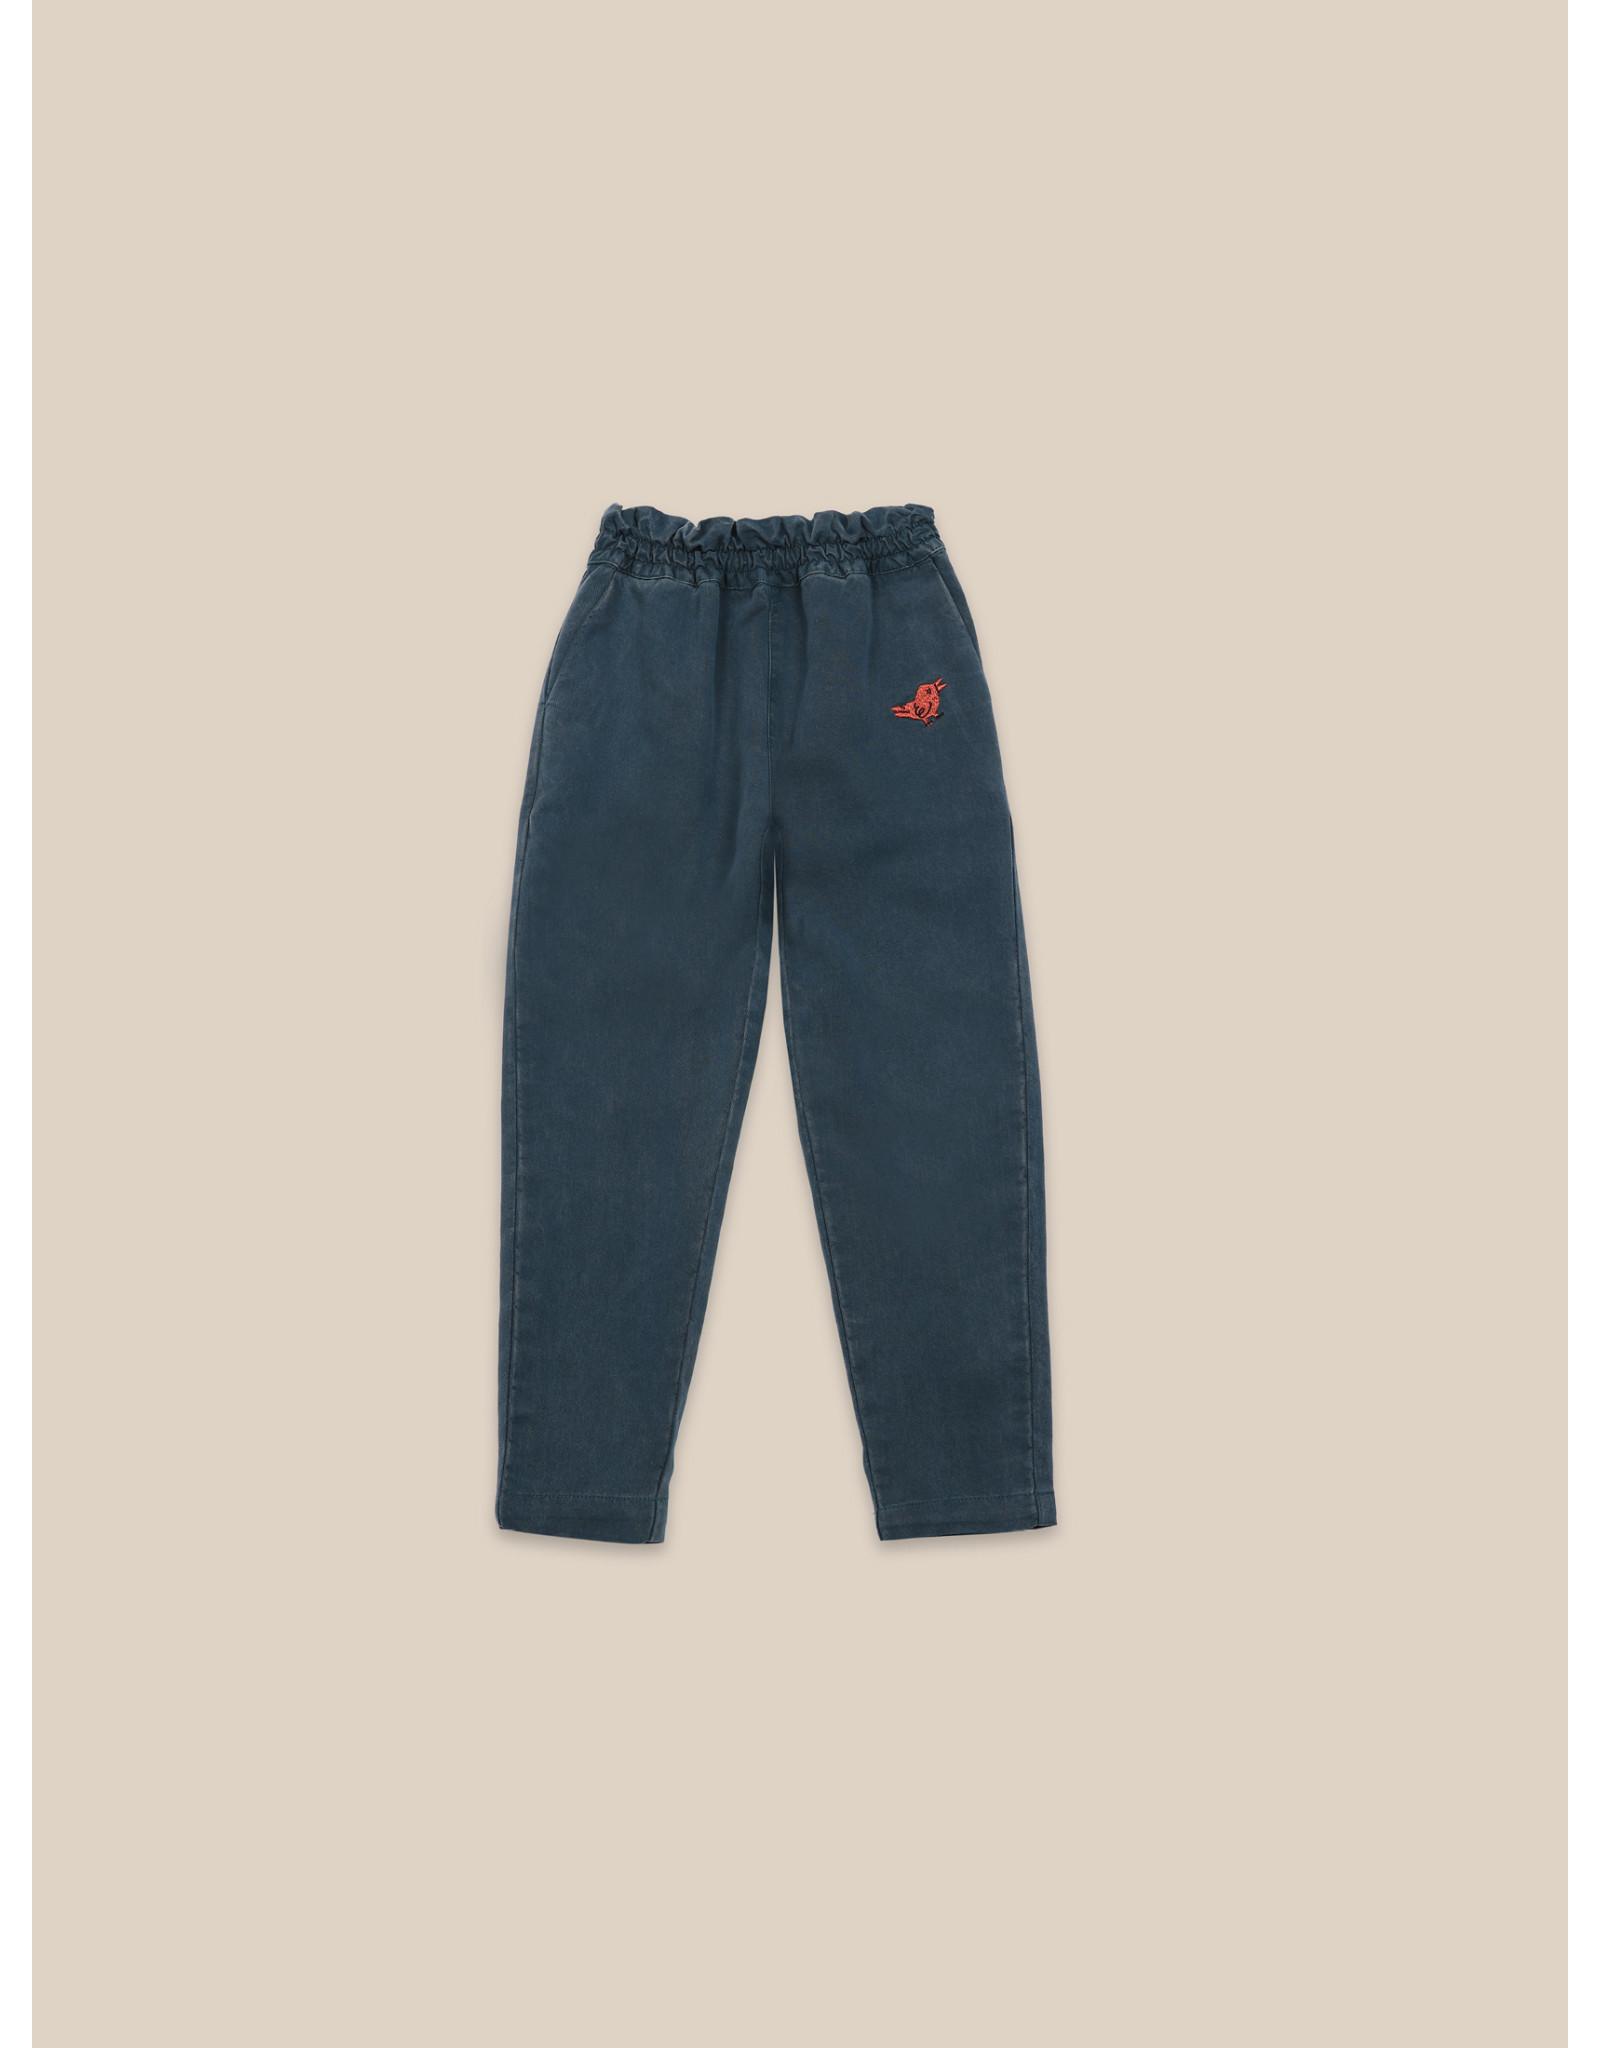 Bobo Choses Bird embroidery woven pants